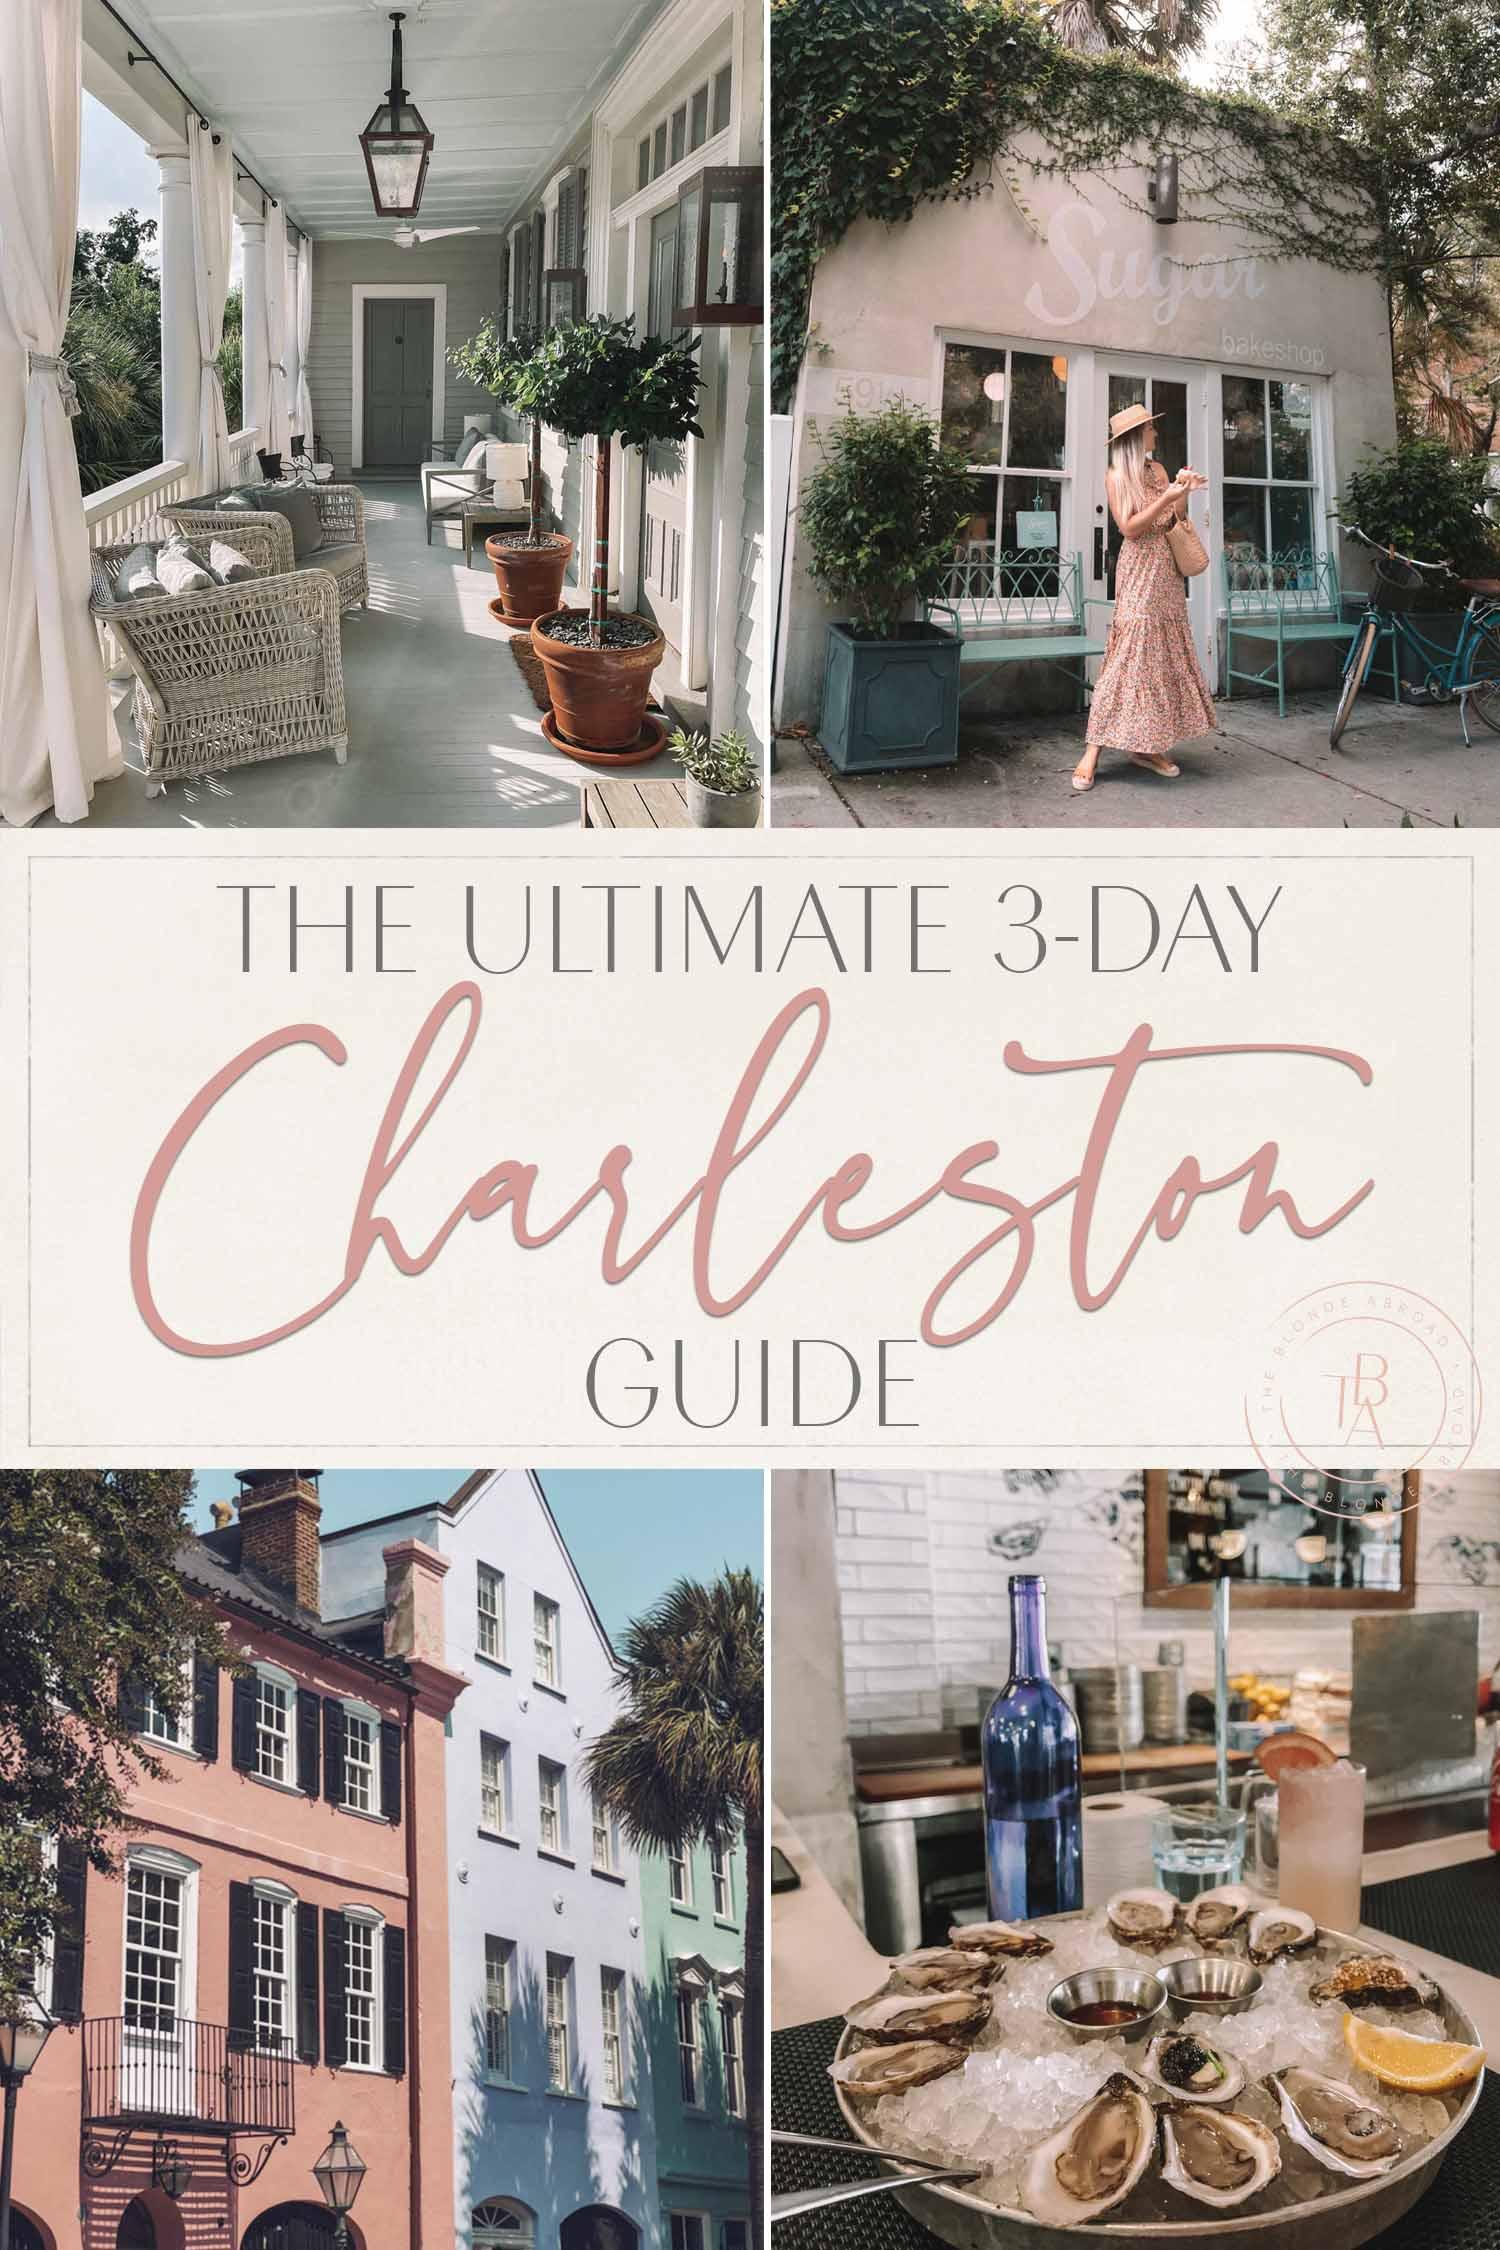 3-Day Charleston Guide